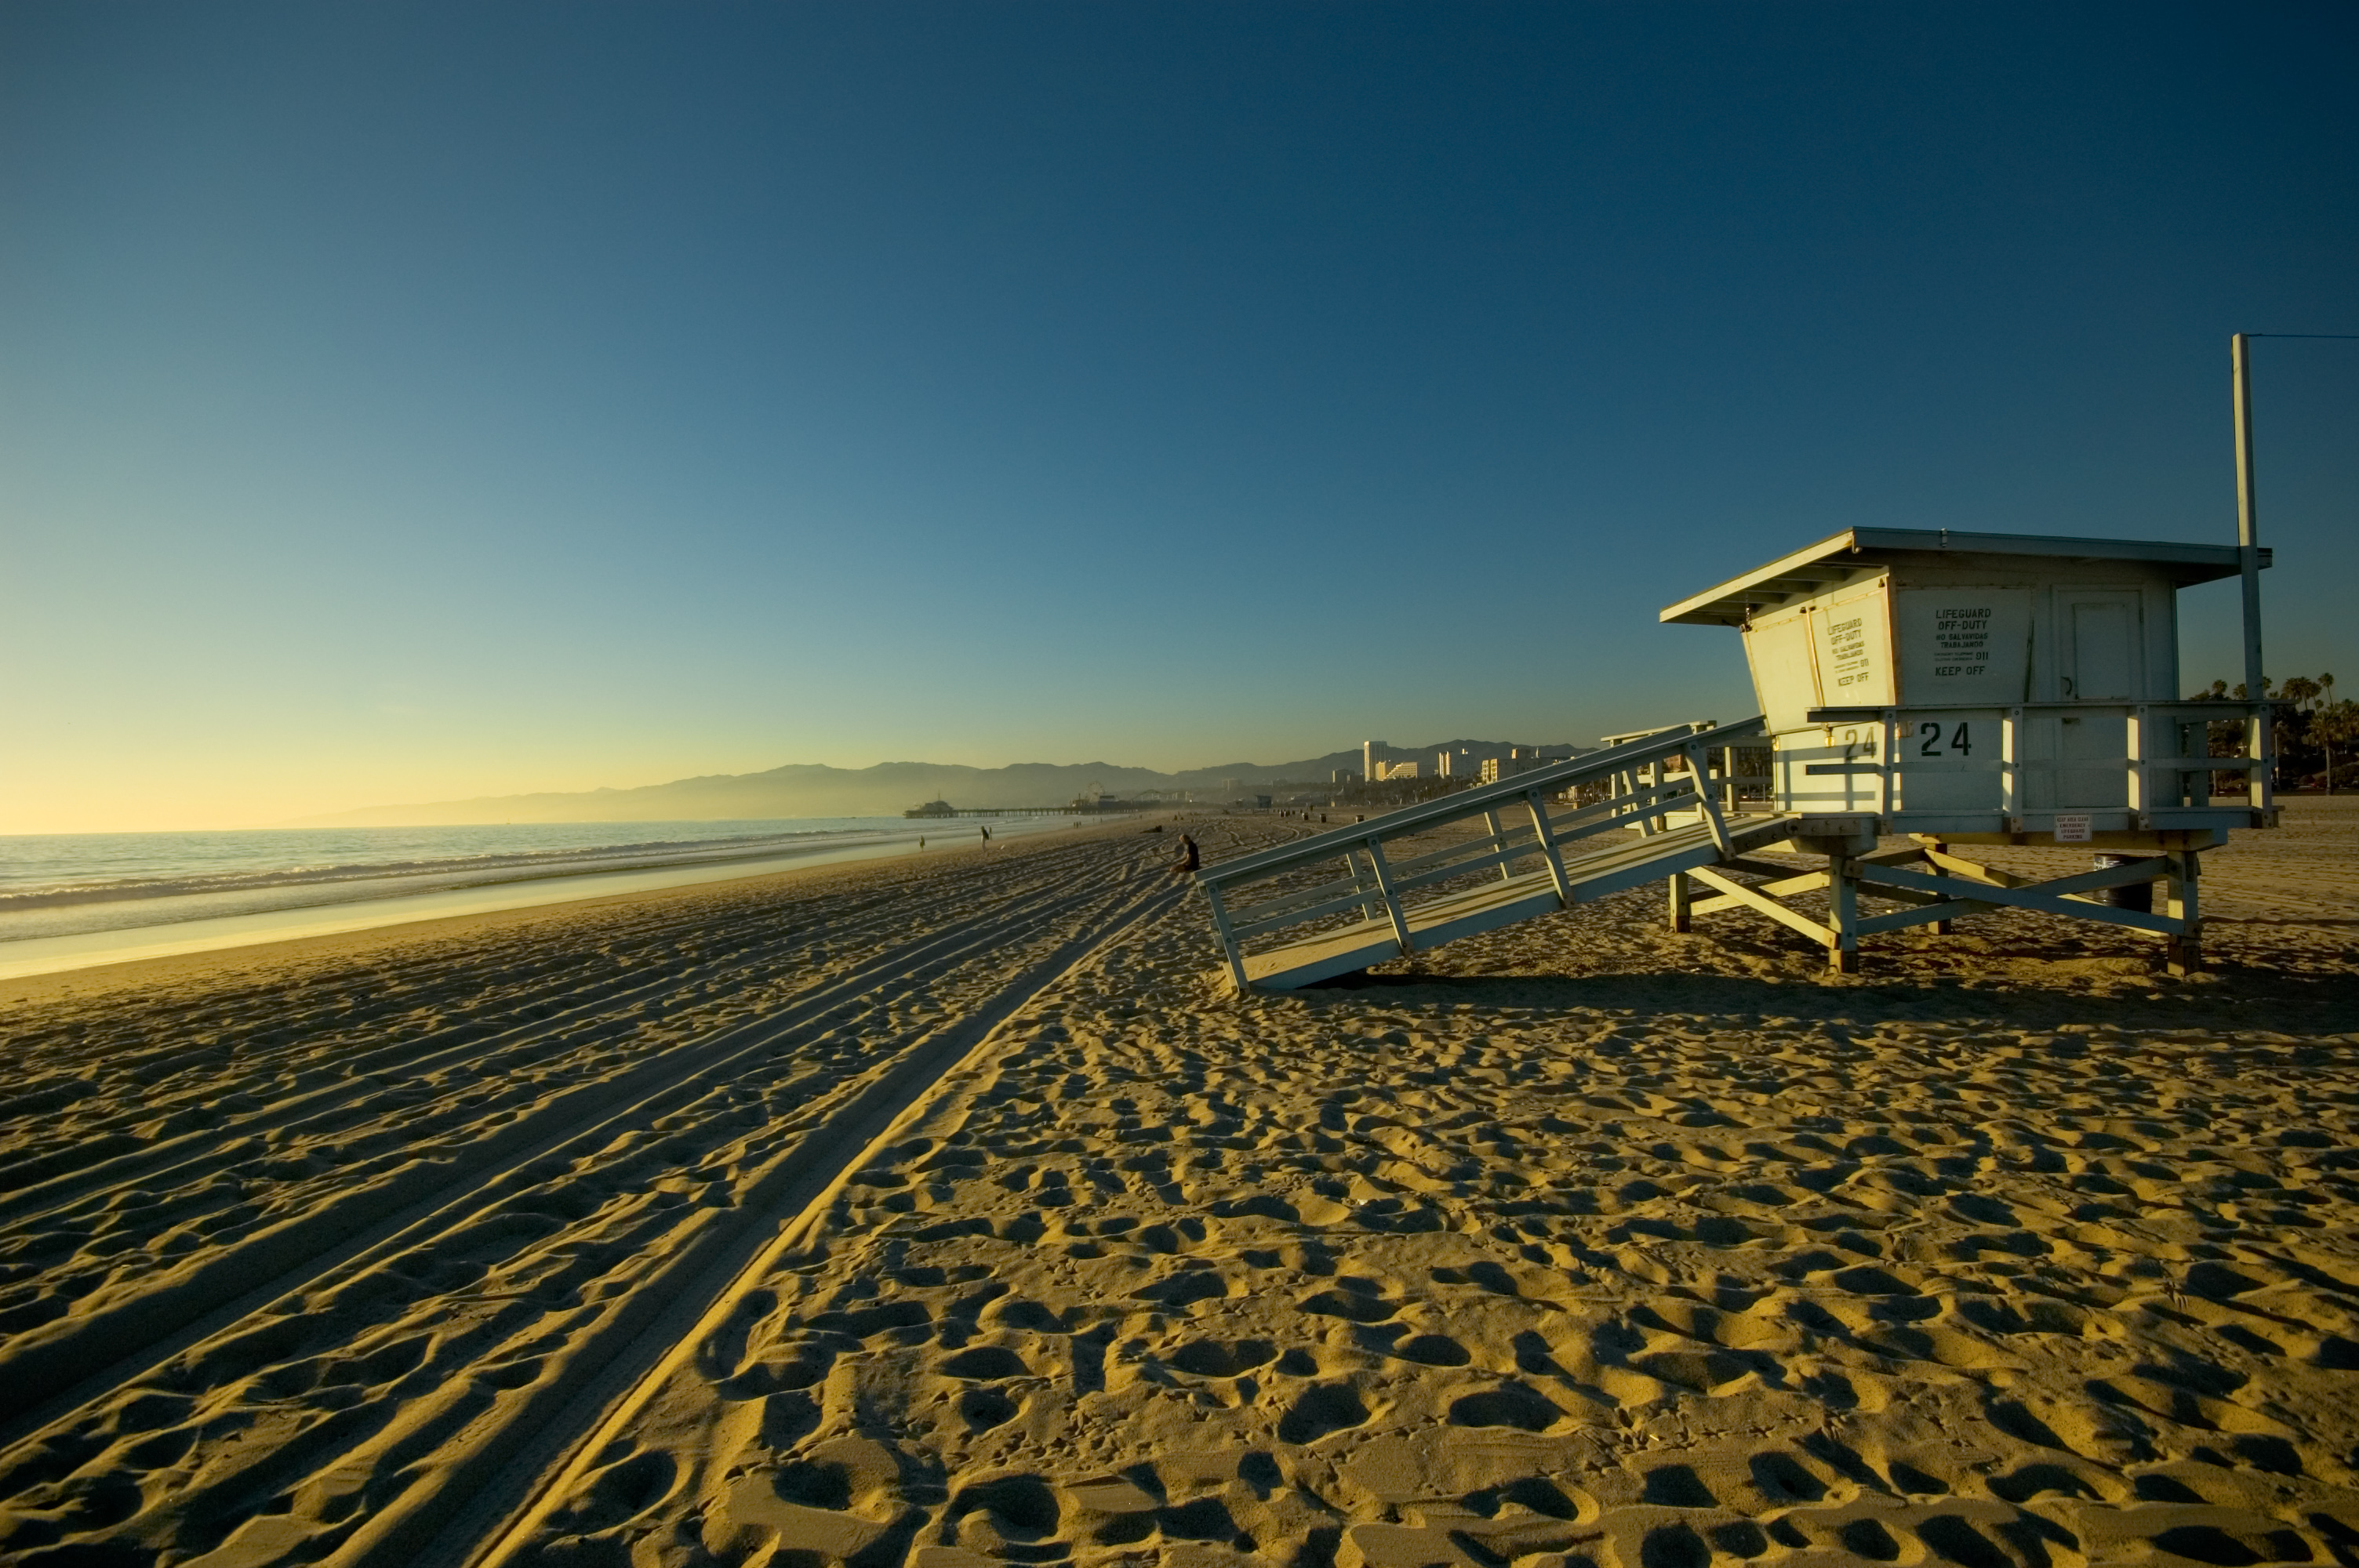 download image venice beach - photo #14